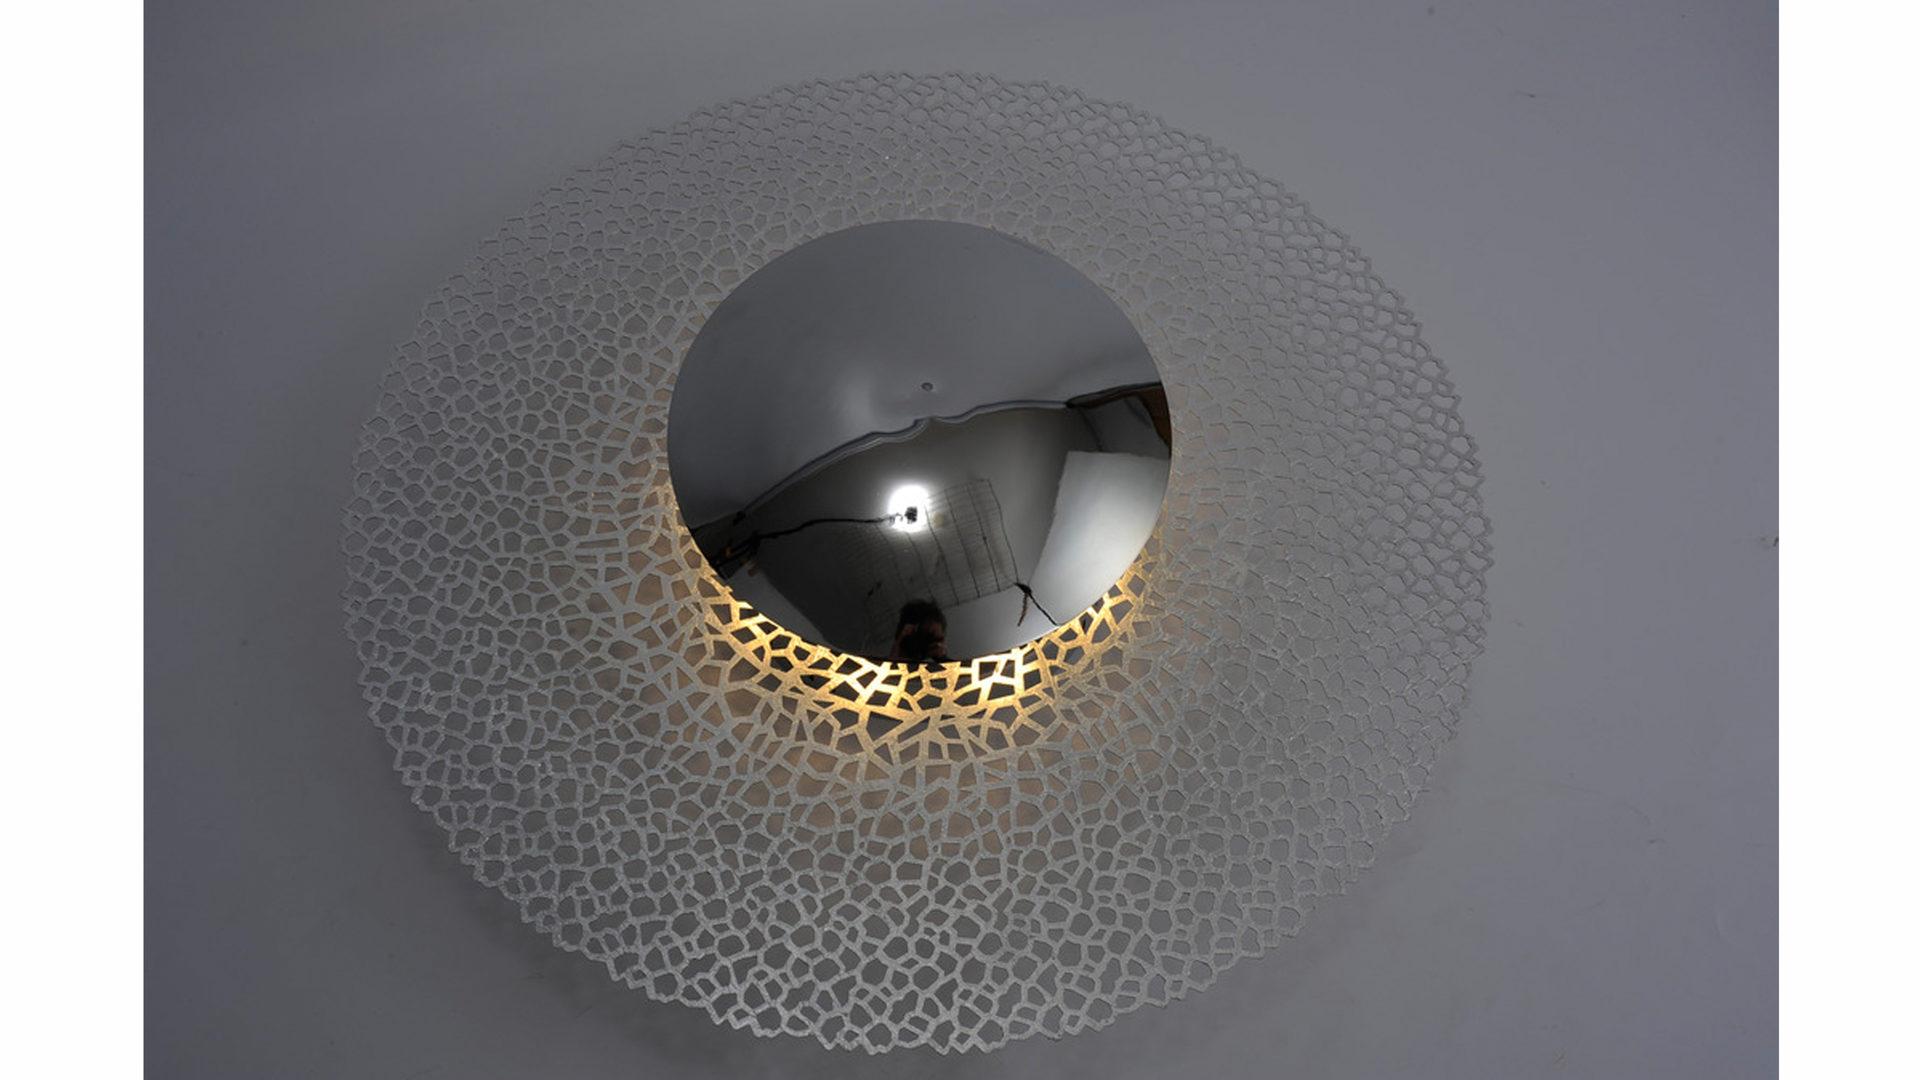 Fabulous Möbel Bernskötter Mülheim, Räume, Wohnzimmer, Lampen + Leuchten &TL96